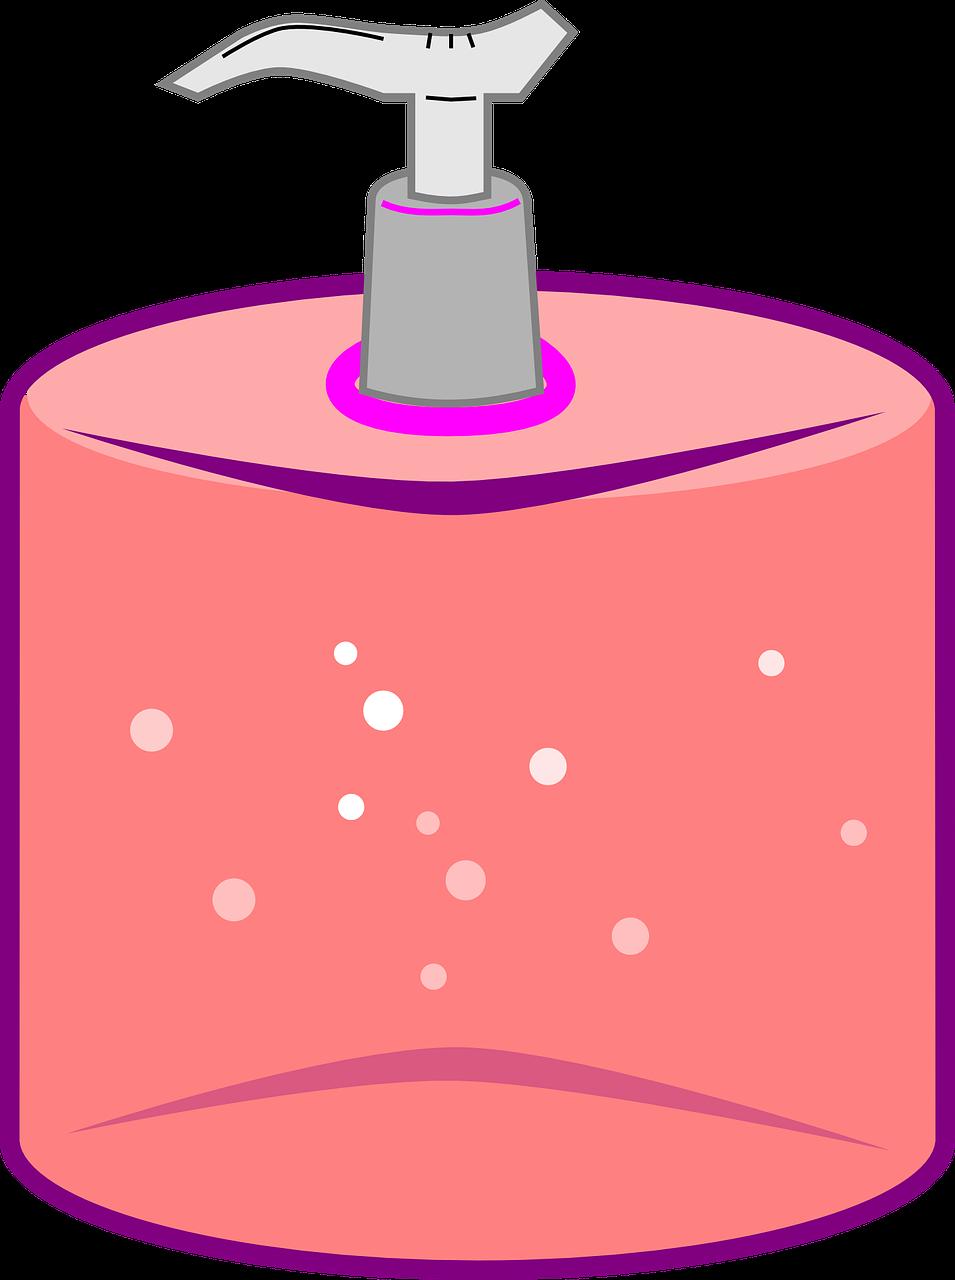 Soap clipart antibacterial soap, Soap antibacterial soap.